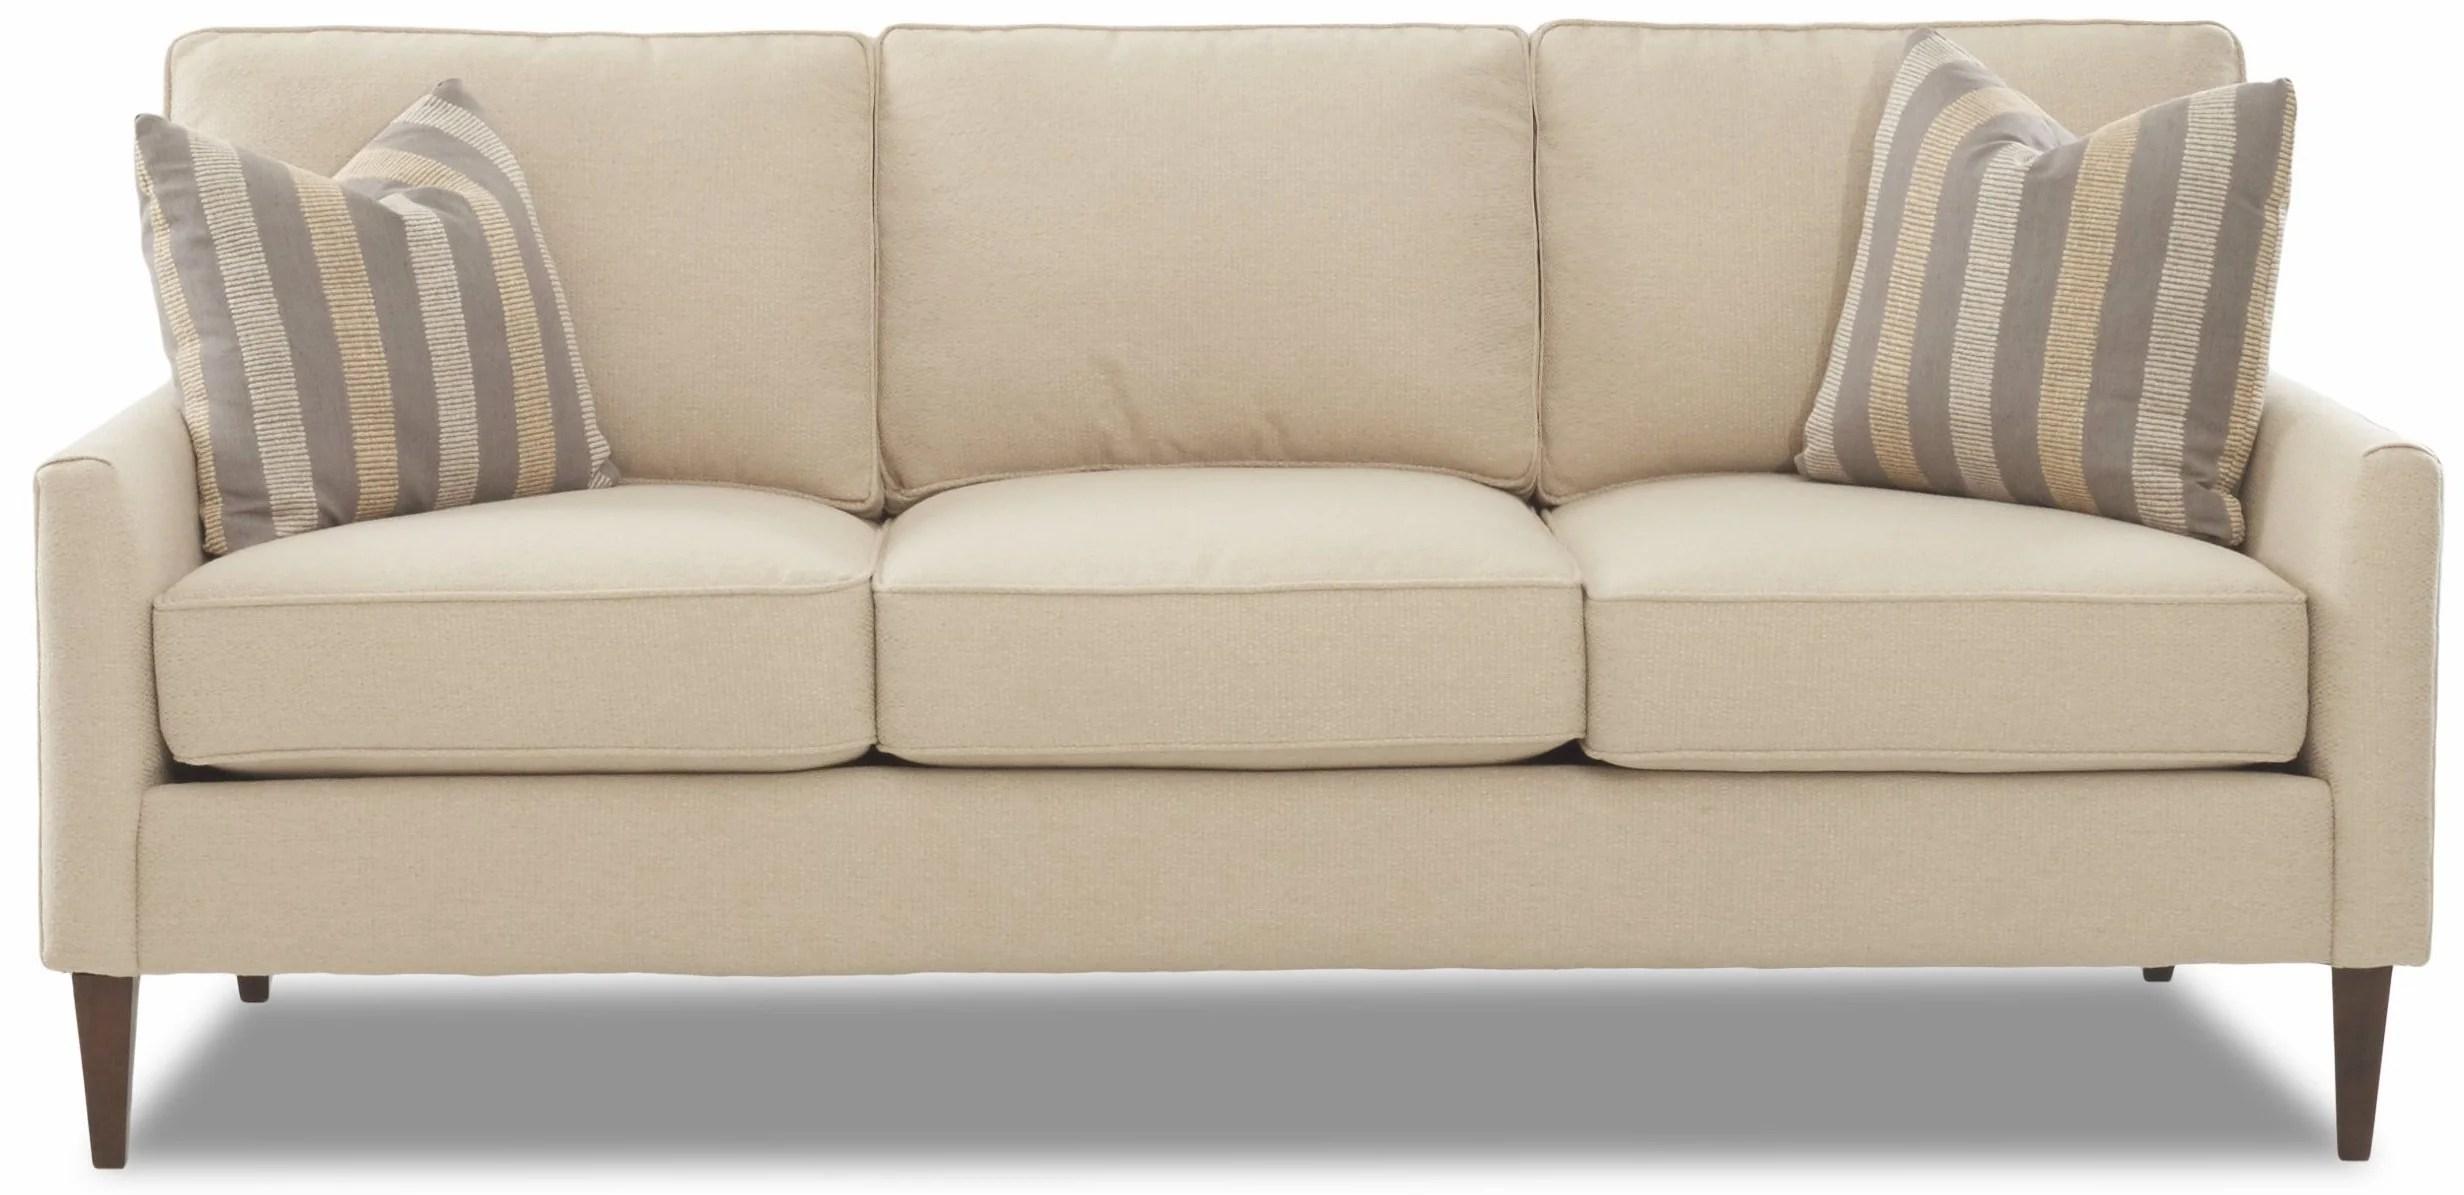 sofa beds on gumtree adelaide fix springs in tribecca stkittsvilla